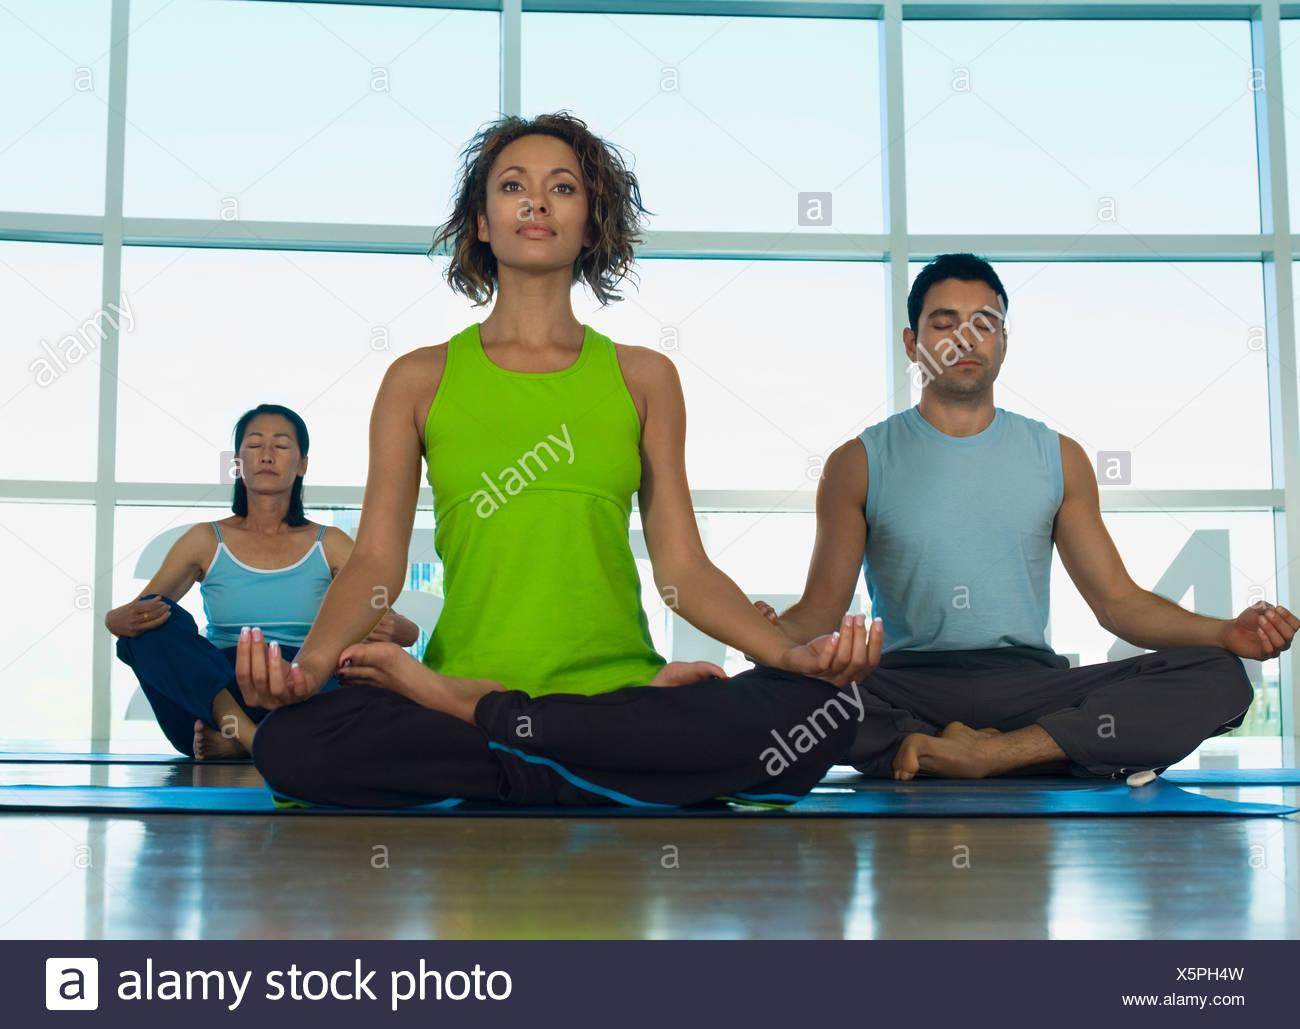 three people doing yoga indoors stock photo 278935577 alamy